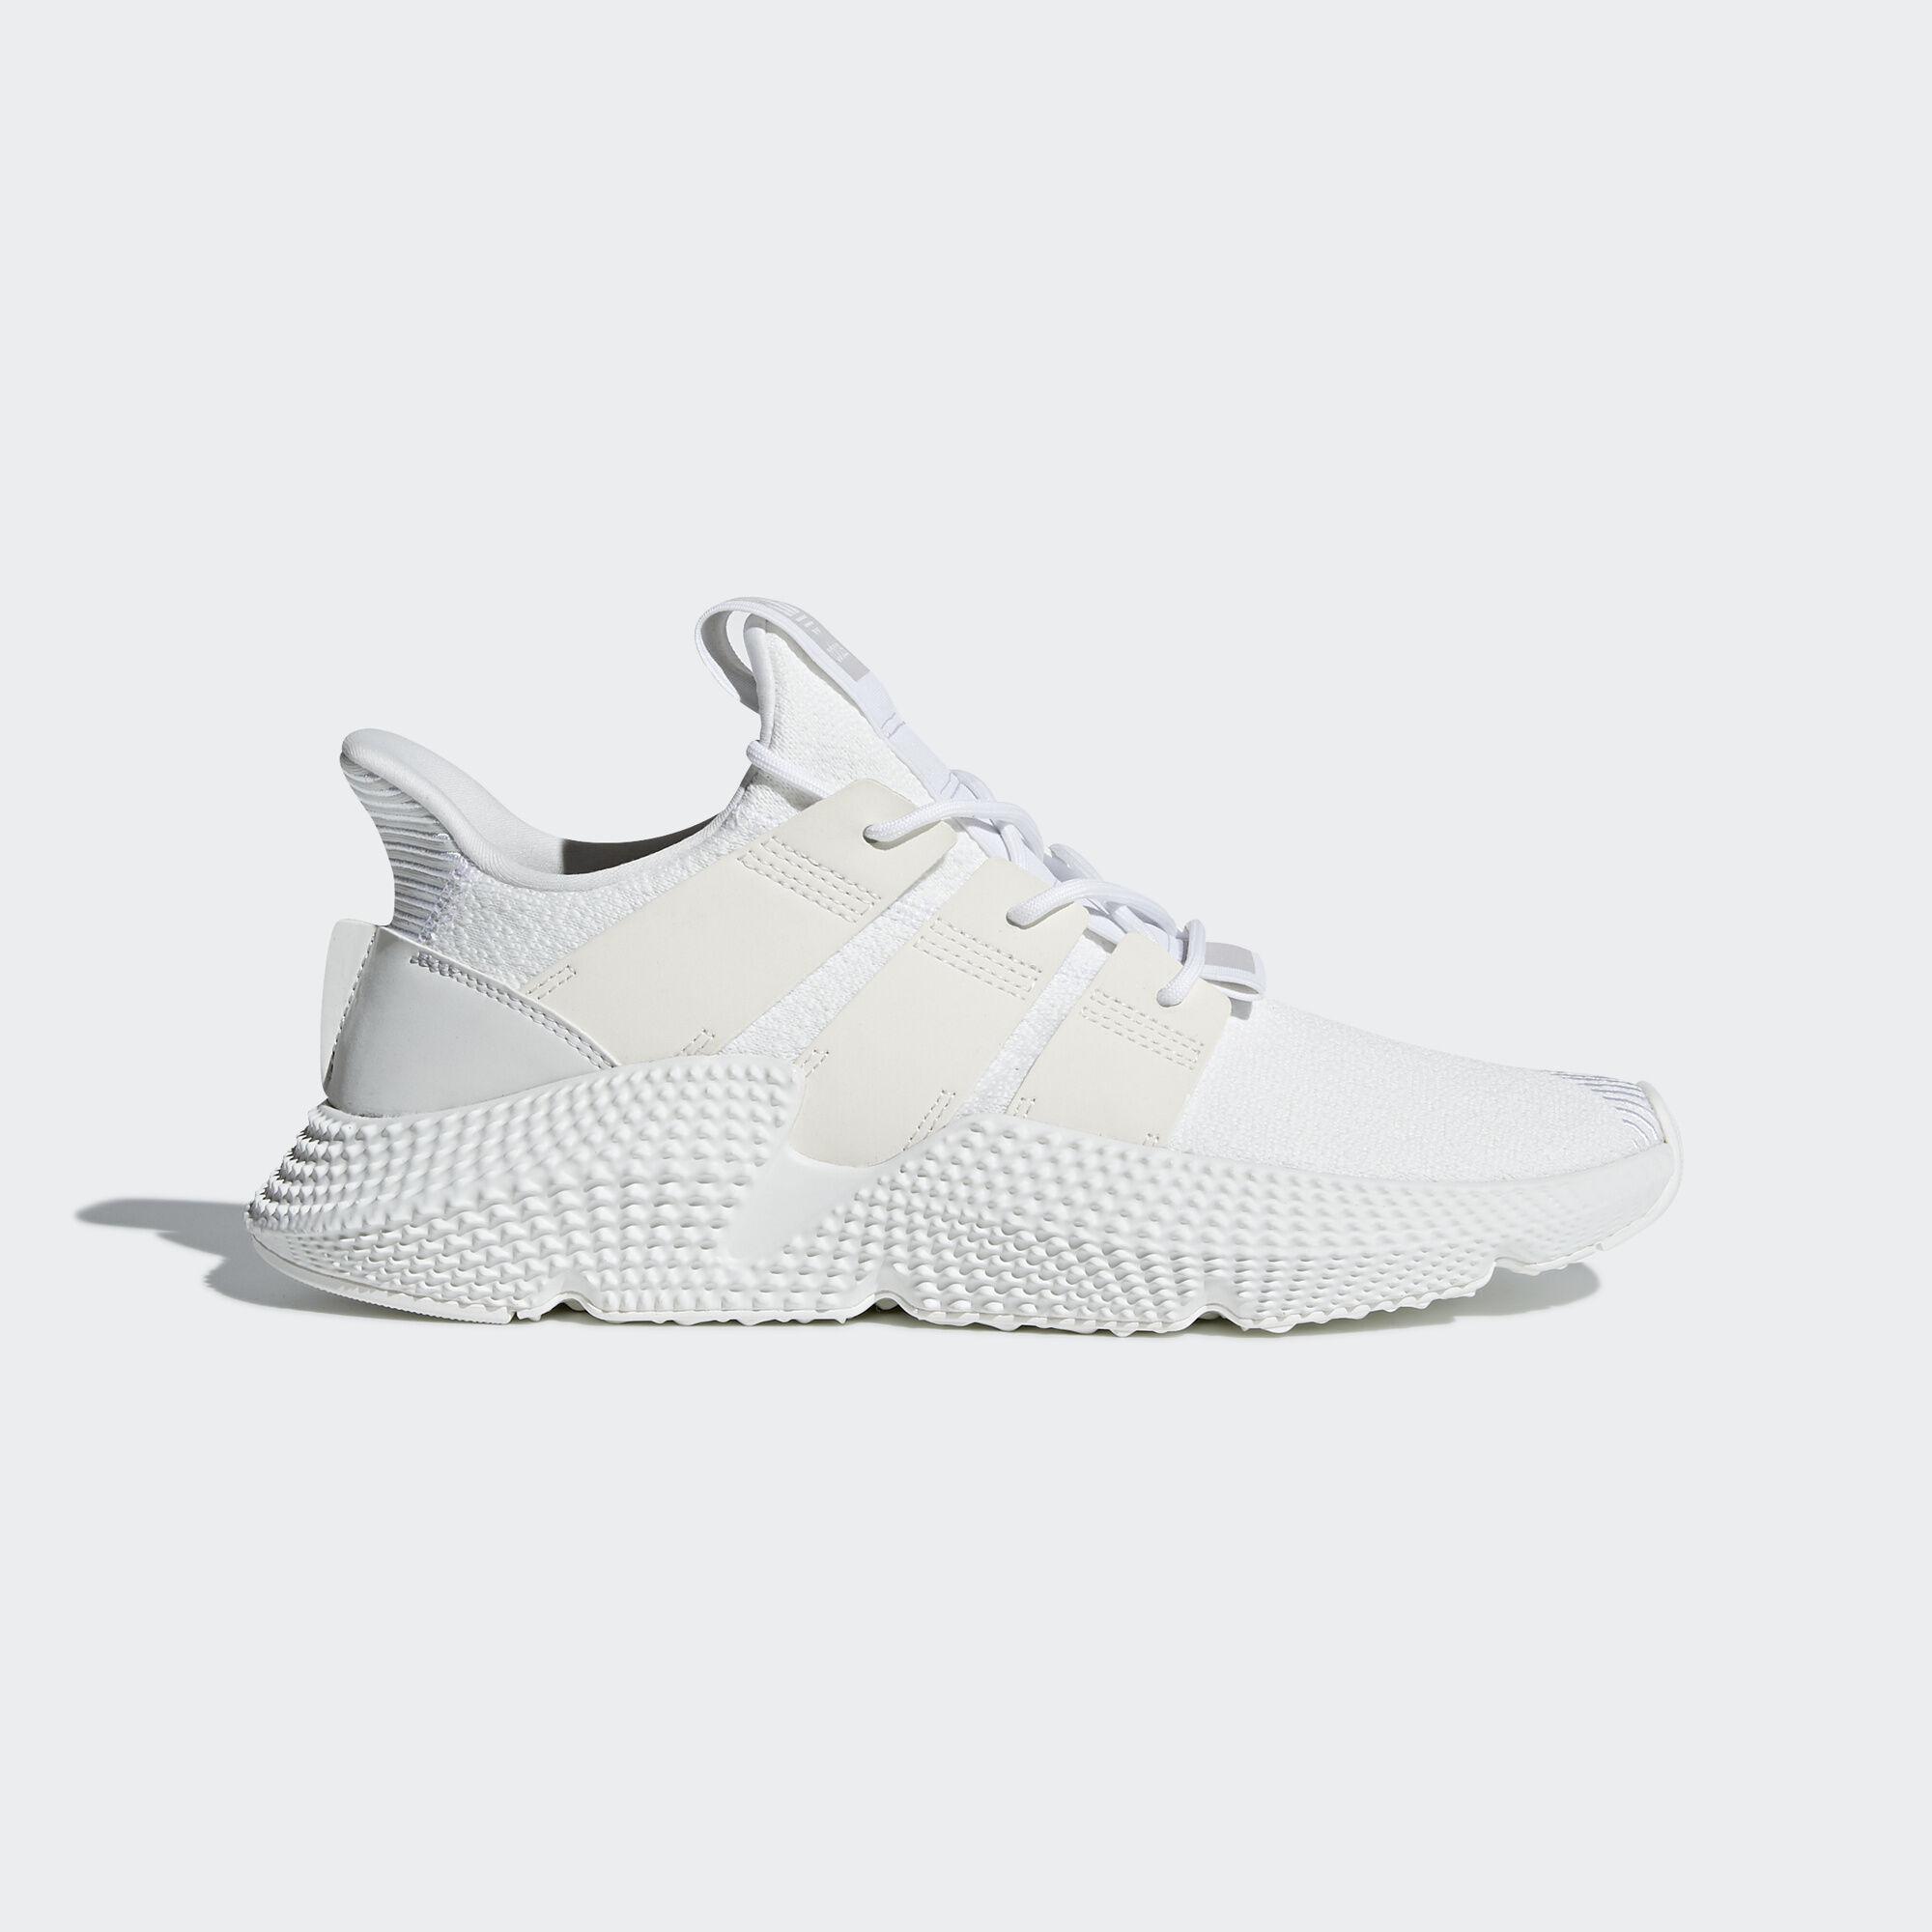 9e274bec2c3 adidas - Prophere Shoes Ftwr White   Ftwr White   Crystal White B37454